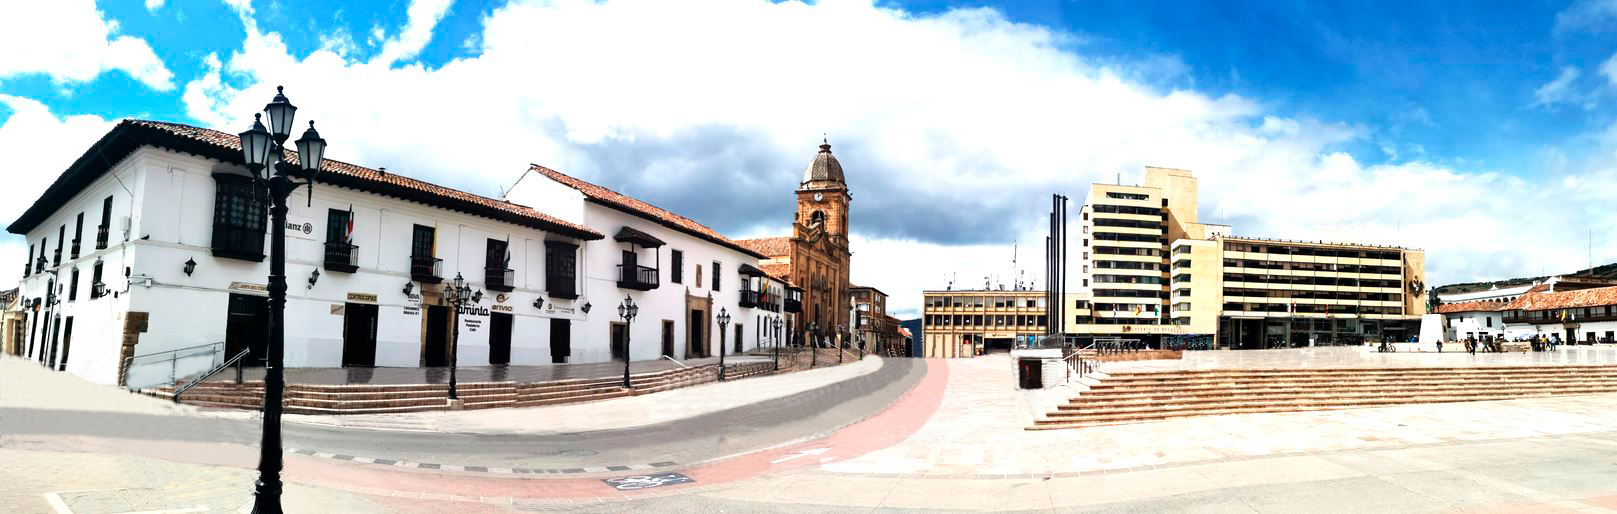 Plaza_Bolivar_Nueva_OKjps